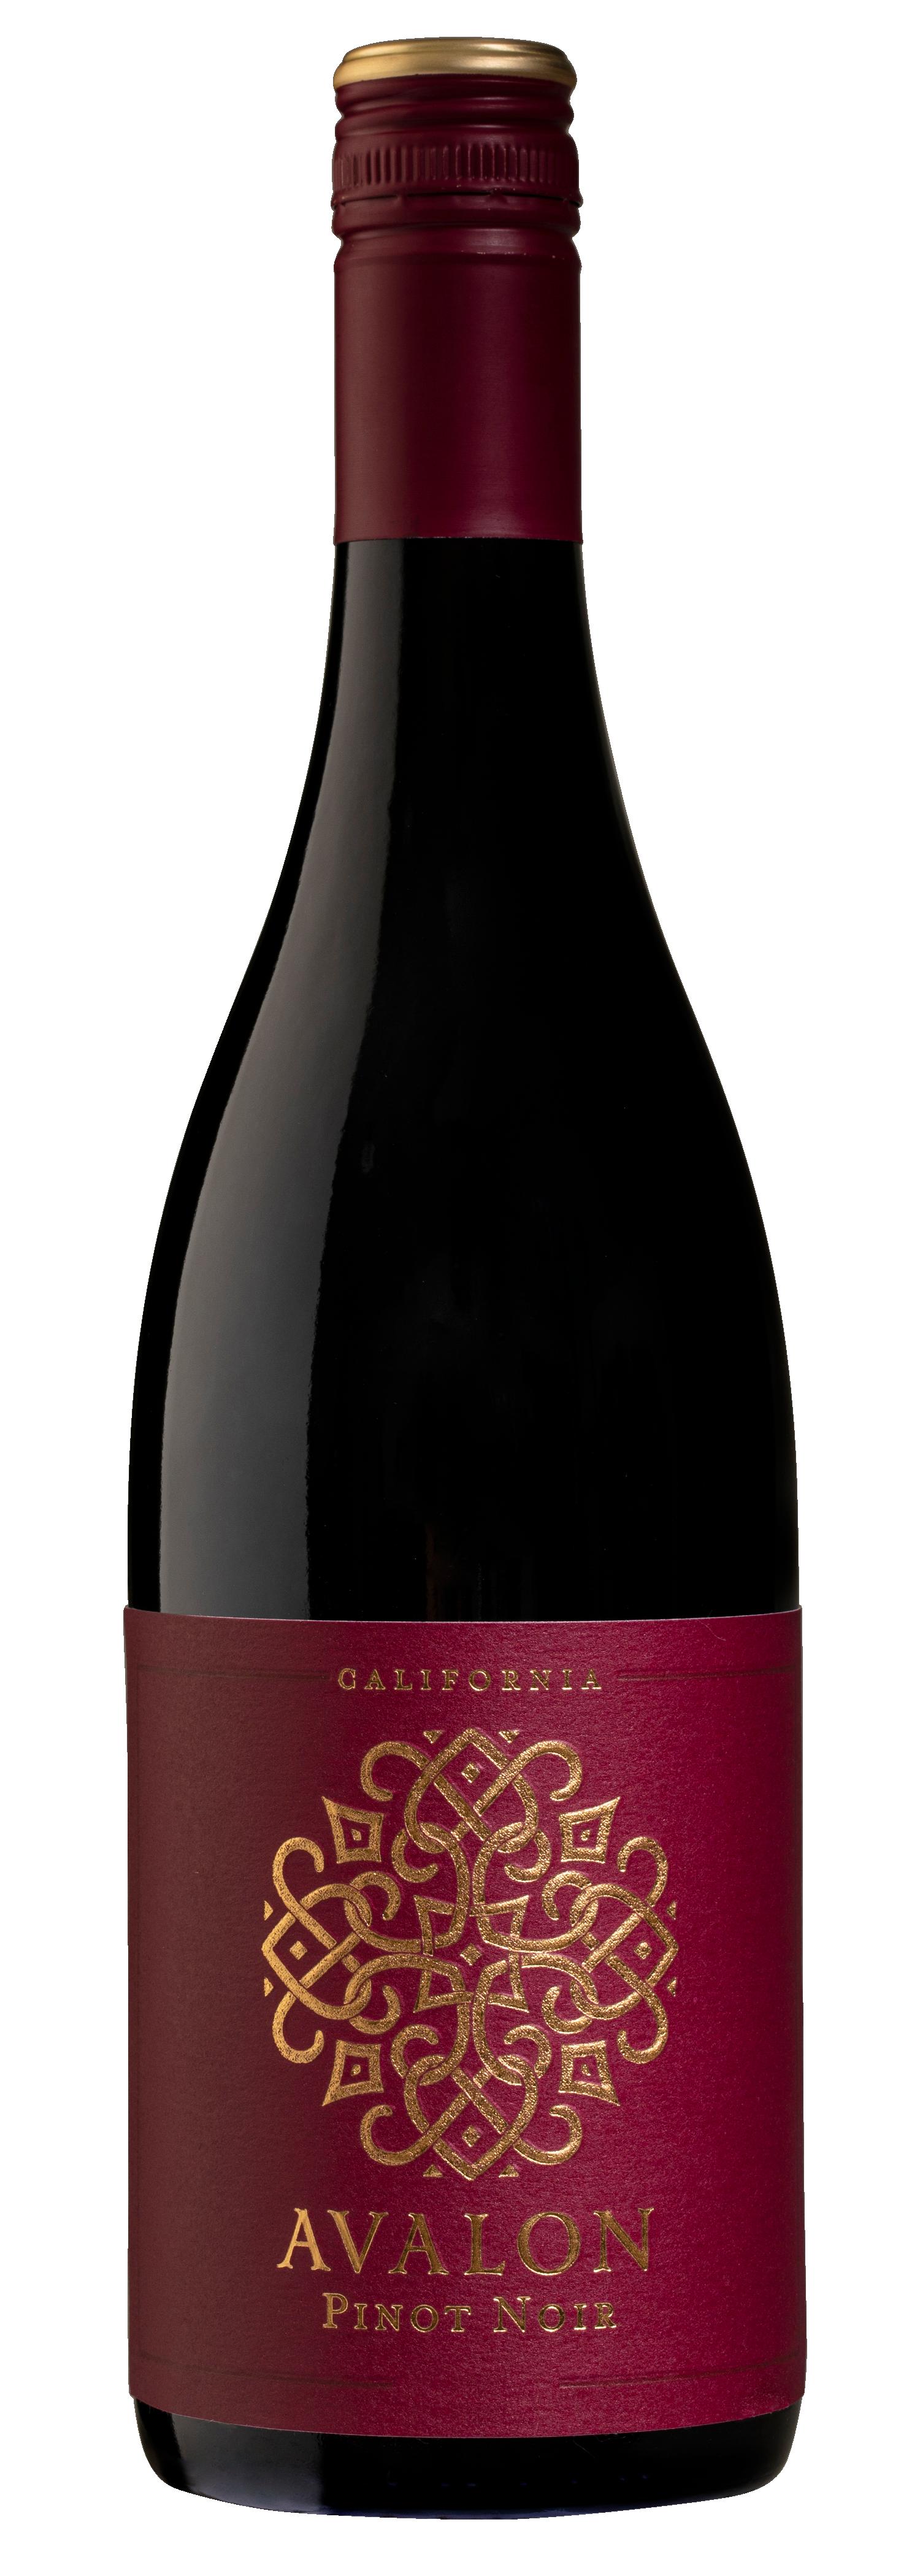 Avalon California Pinot Noir